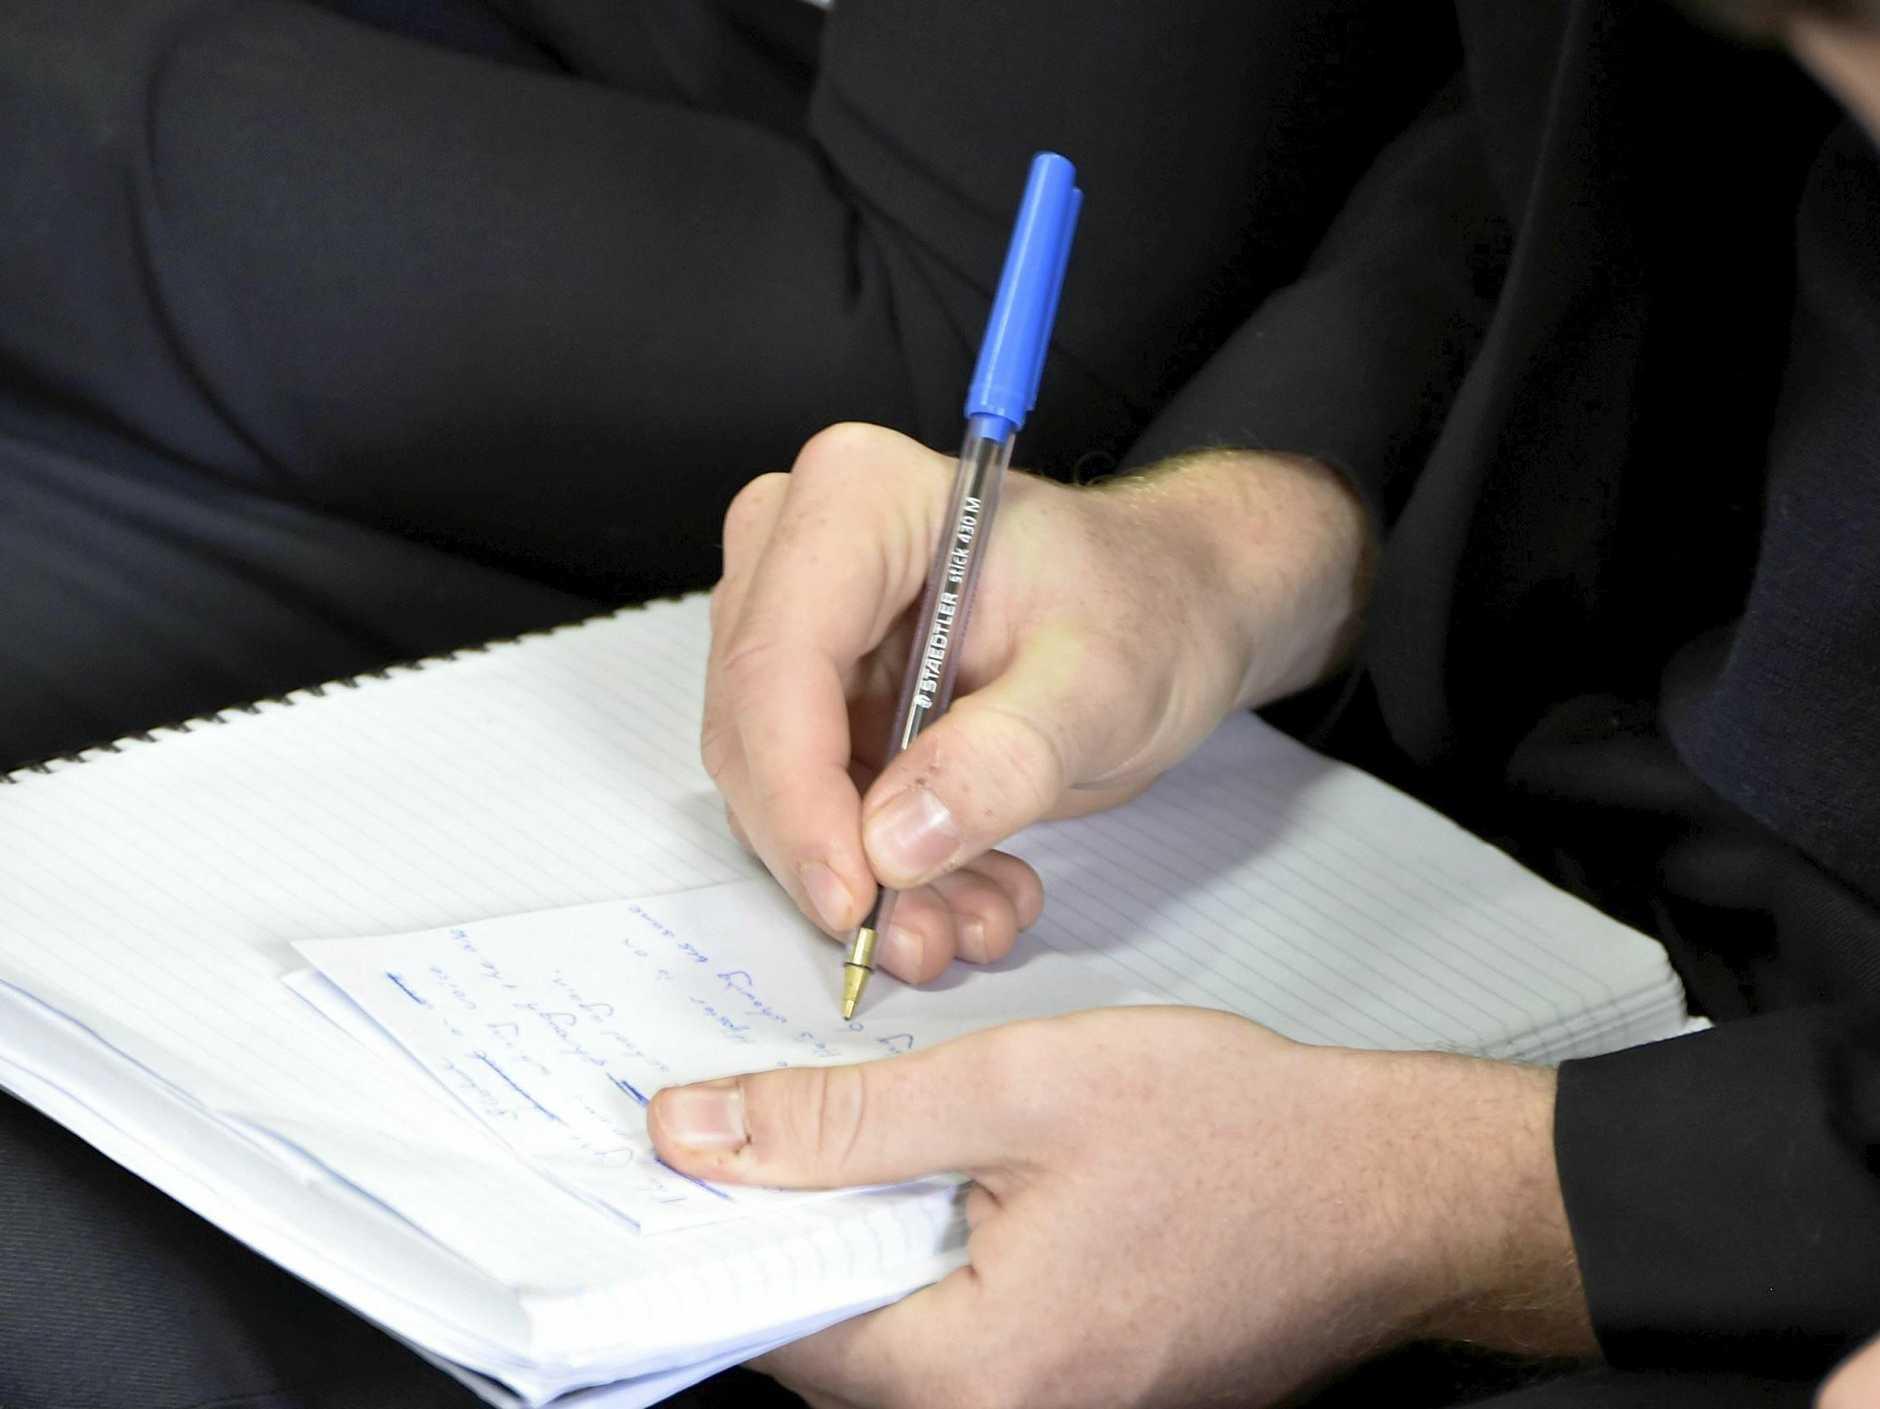 Scriptophobia is the fear of writing in public.